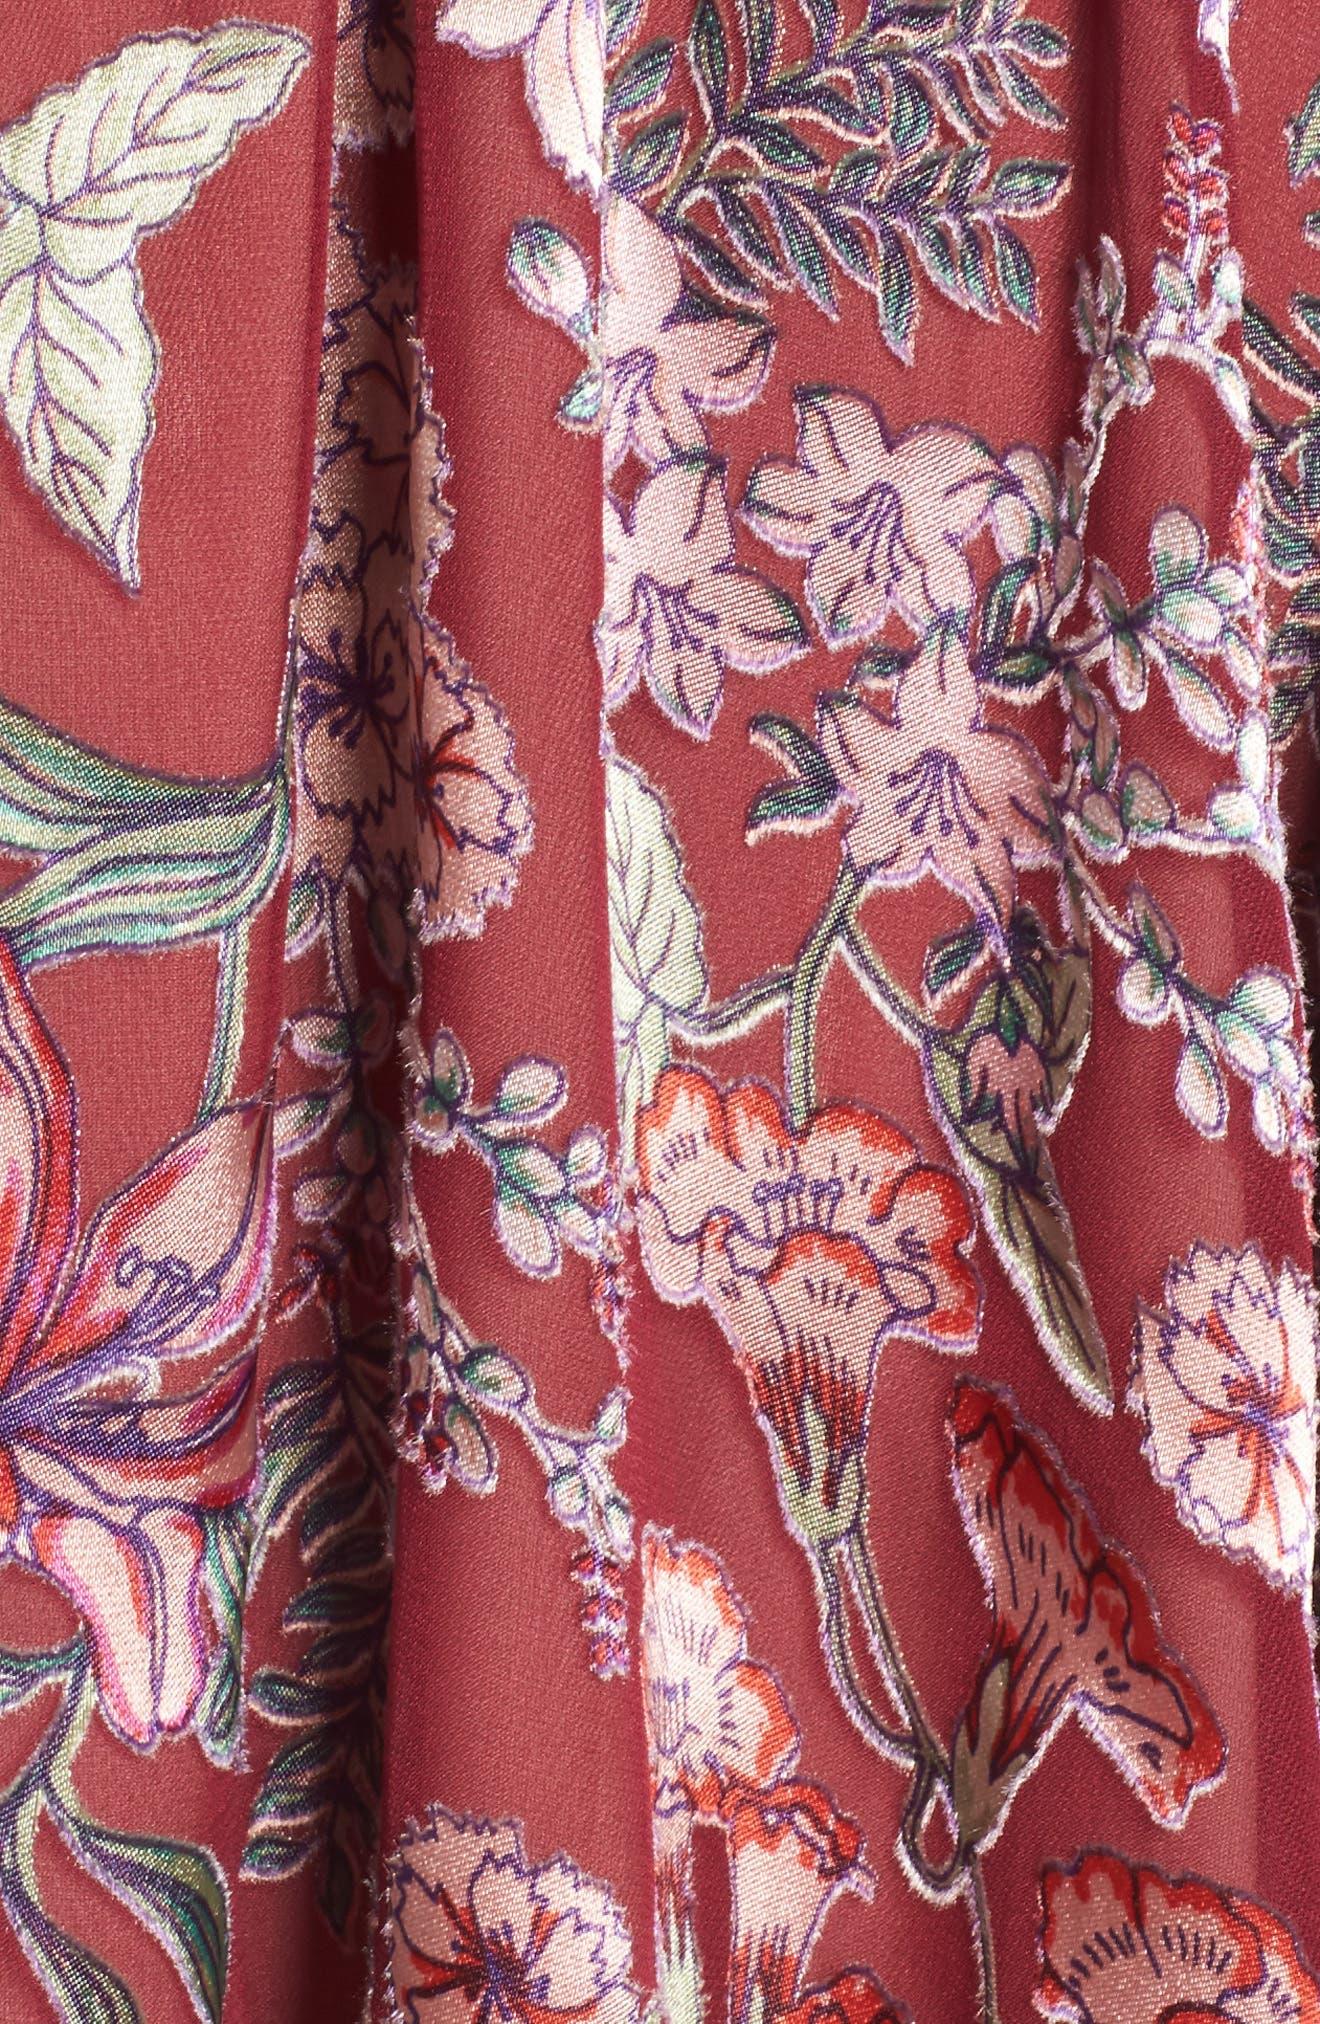 Flora Minidress,                             Alternate thumbnail 5, color,                             Berry Floral